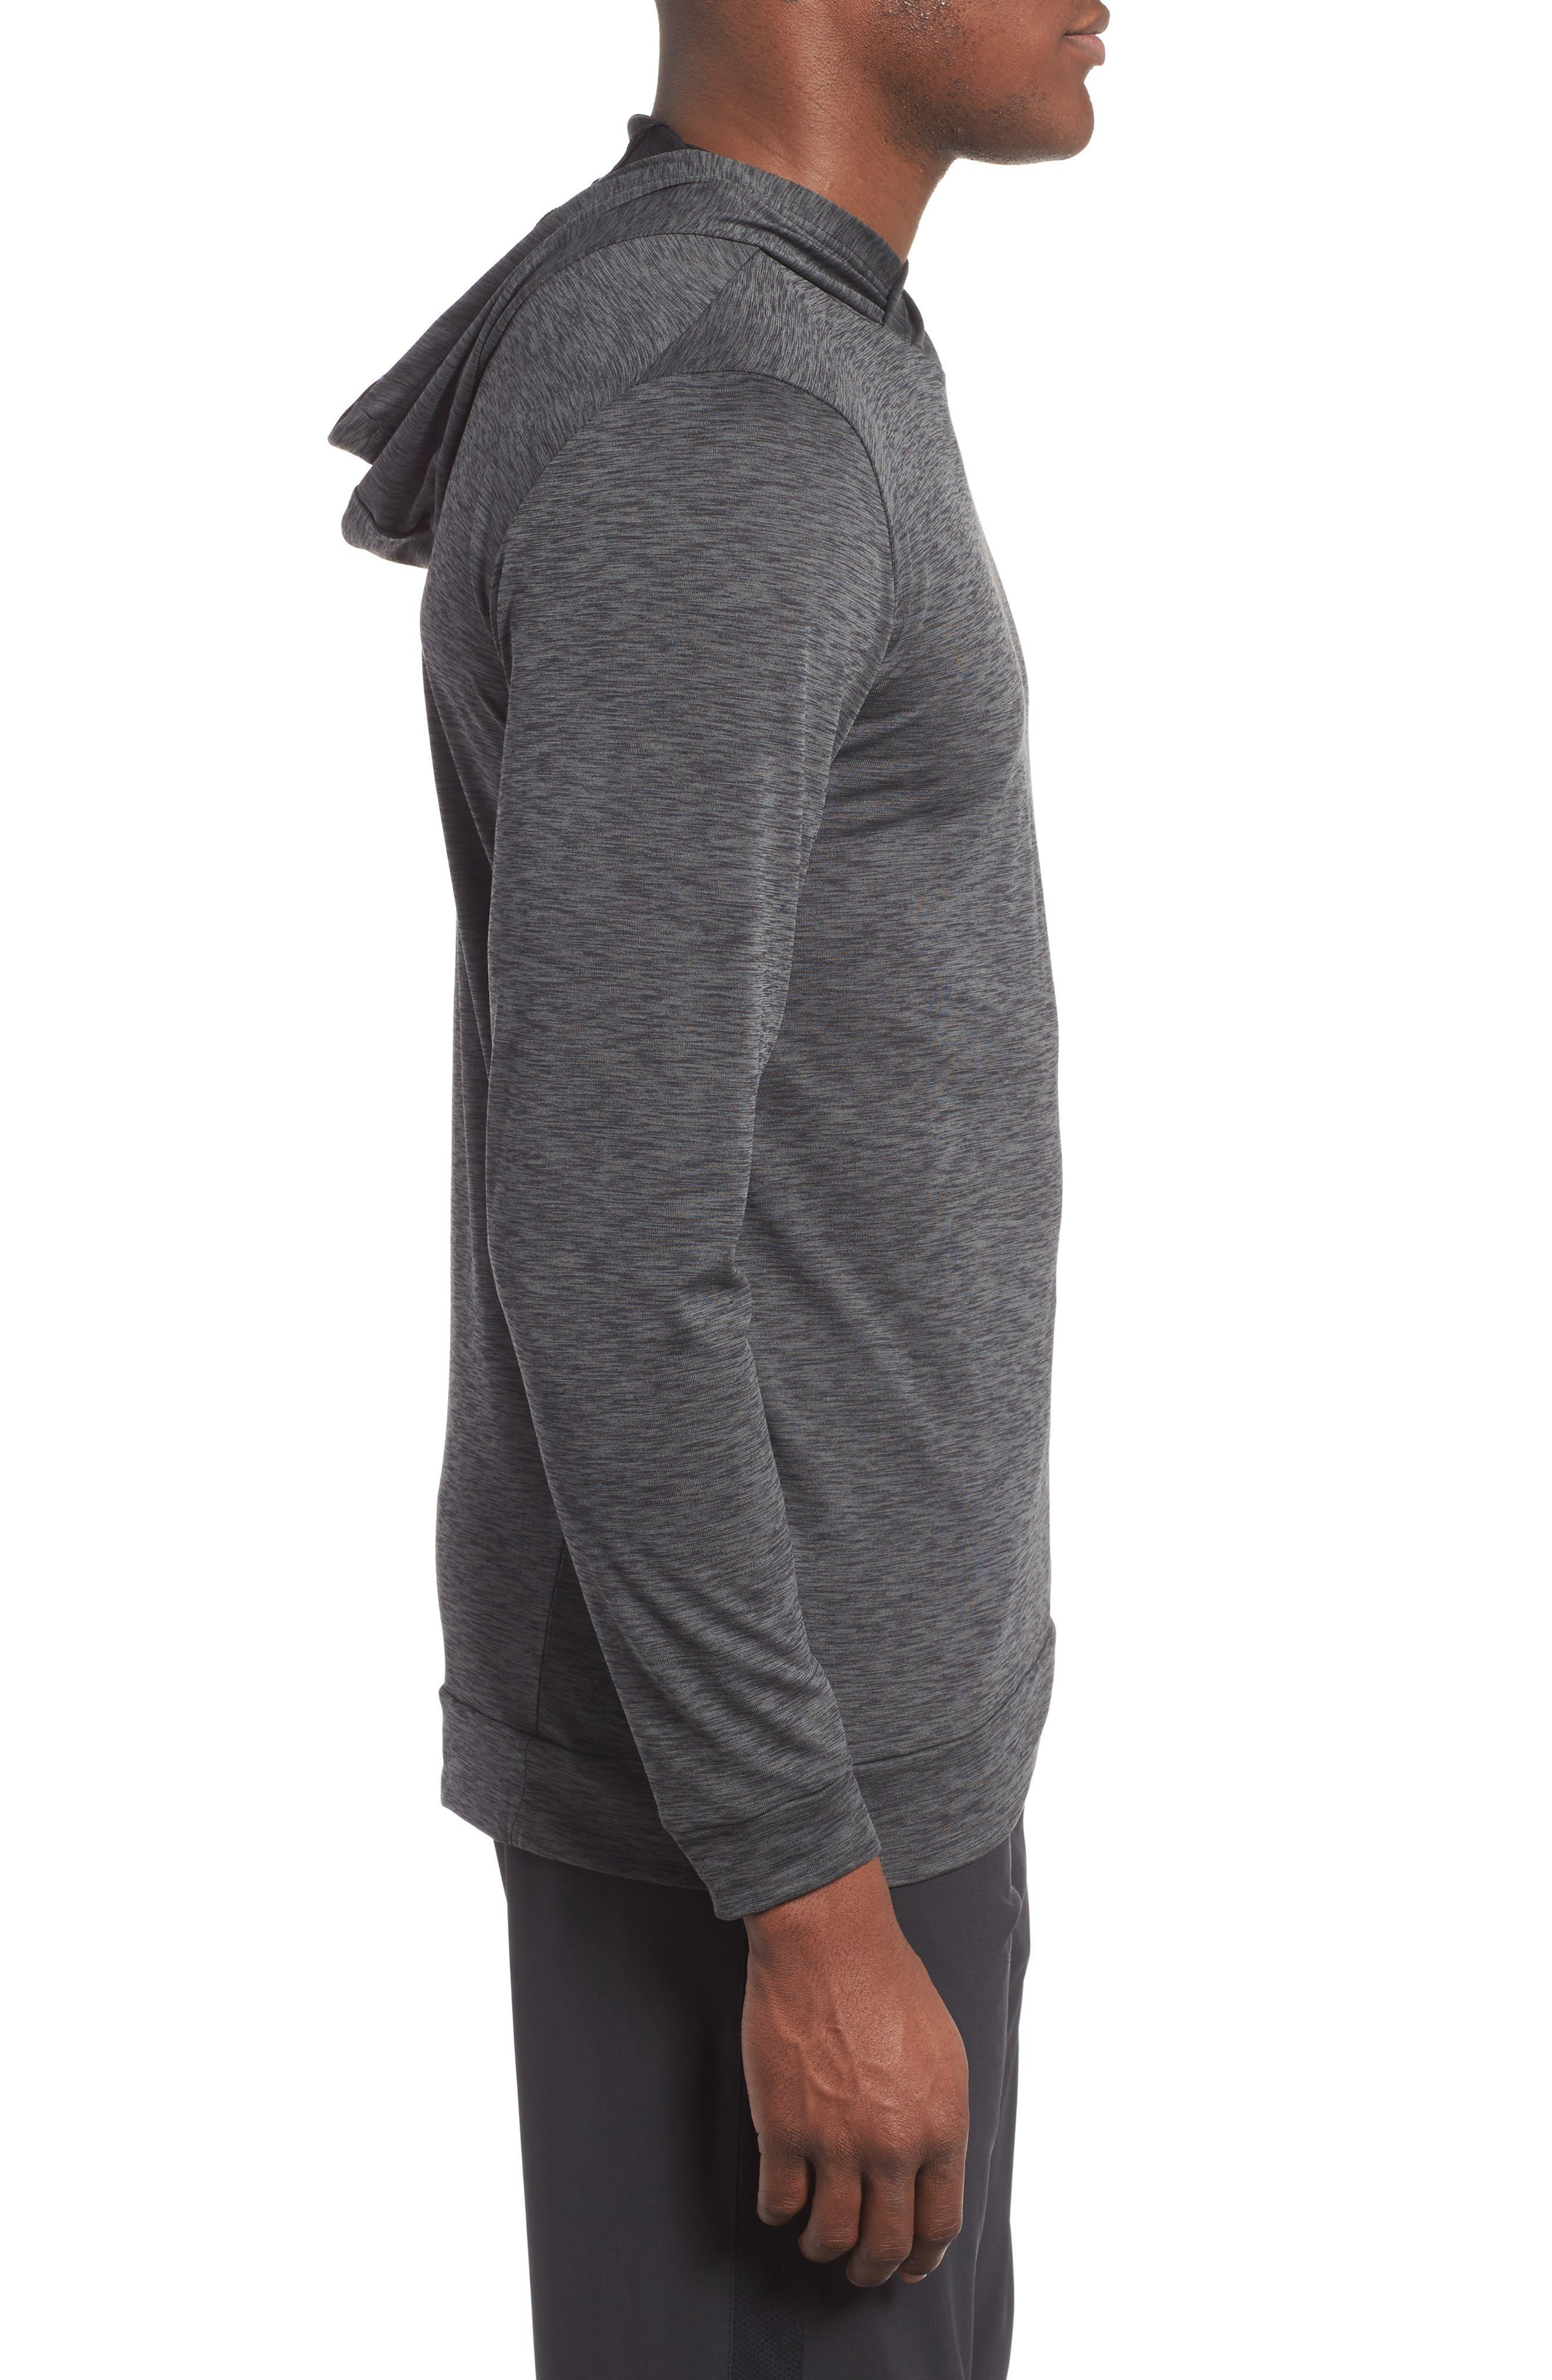 Hyper Dry Regular Fit Training Hoodie,                             Alternate thumbnail 3, color,                             ANTHRACITE/BLACK/BLACK